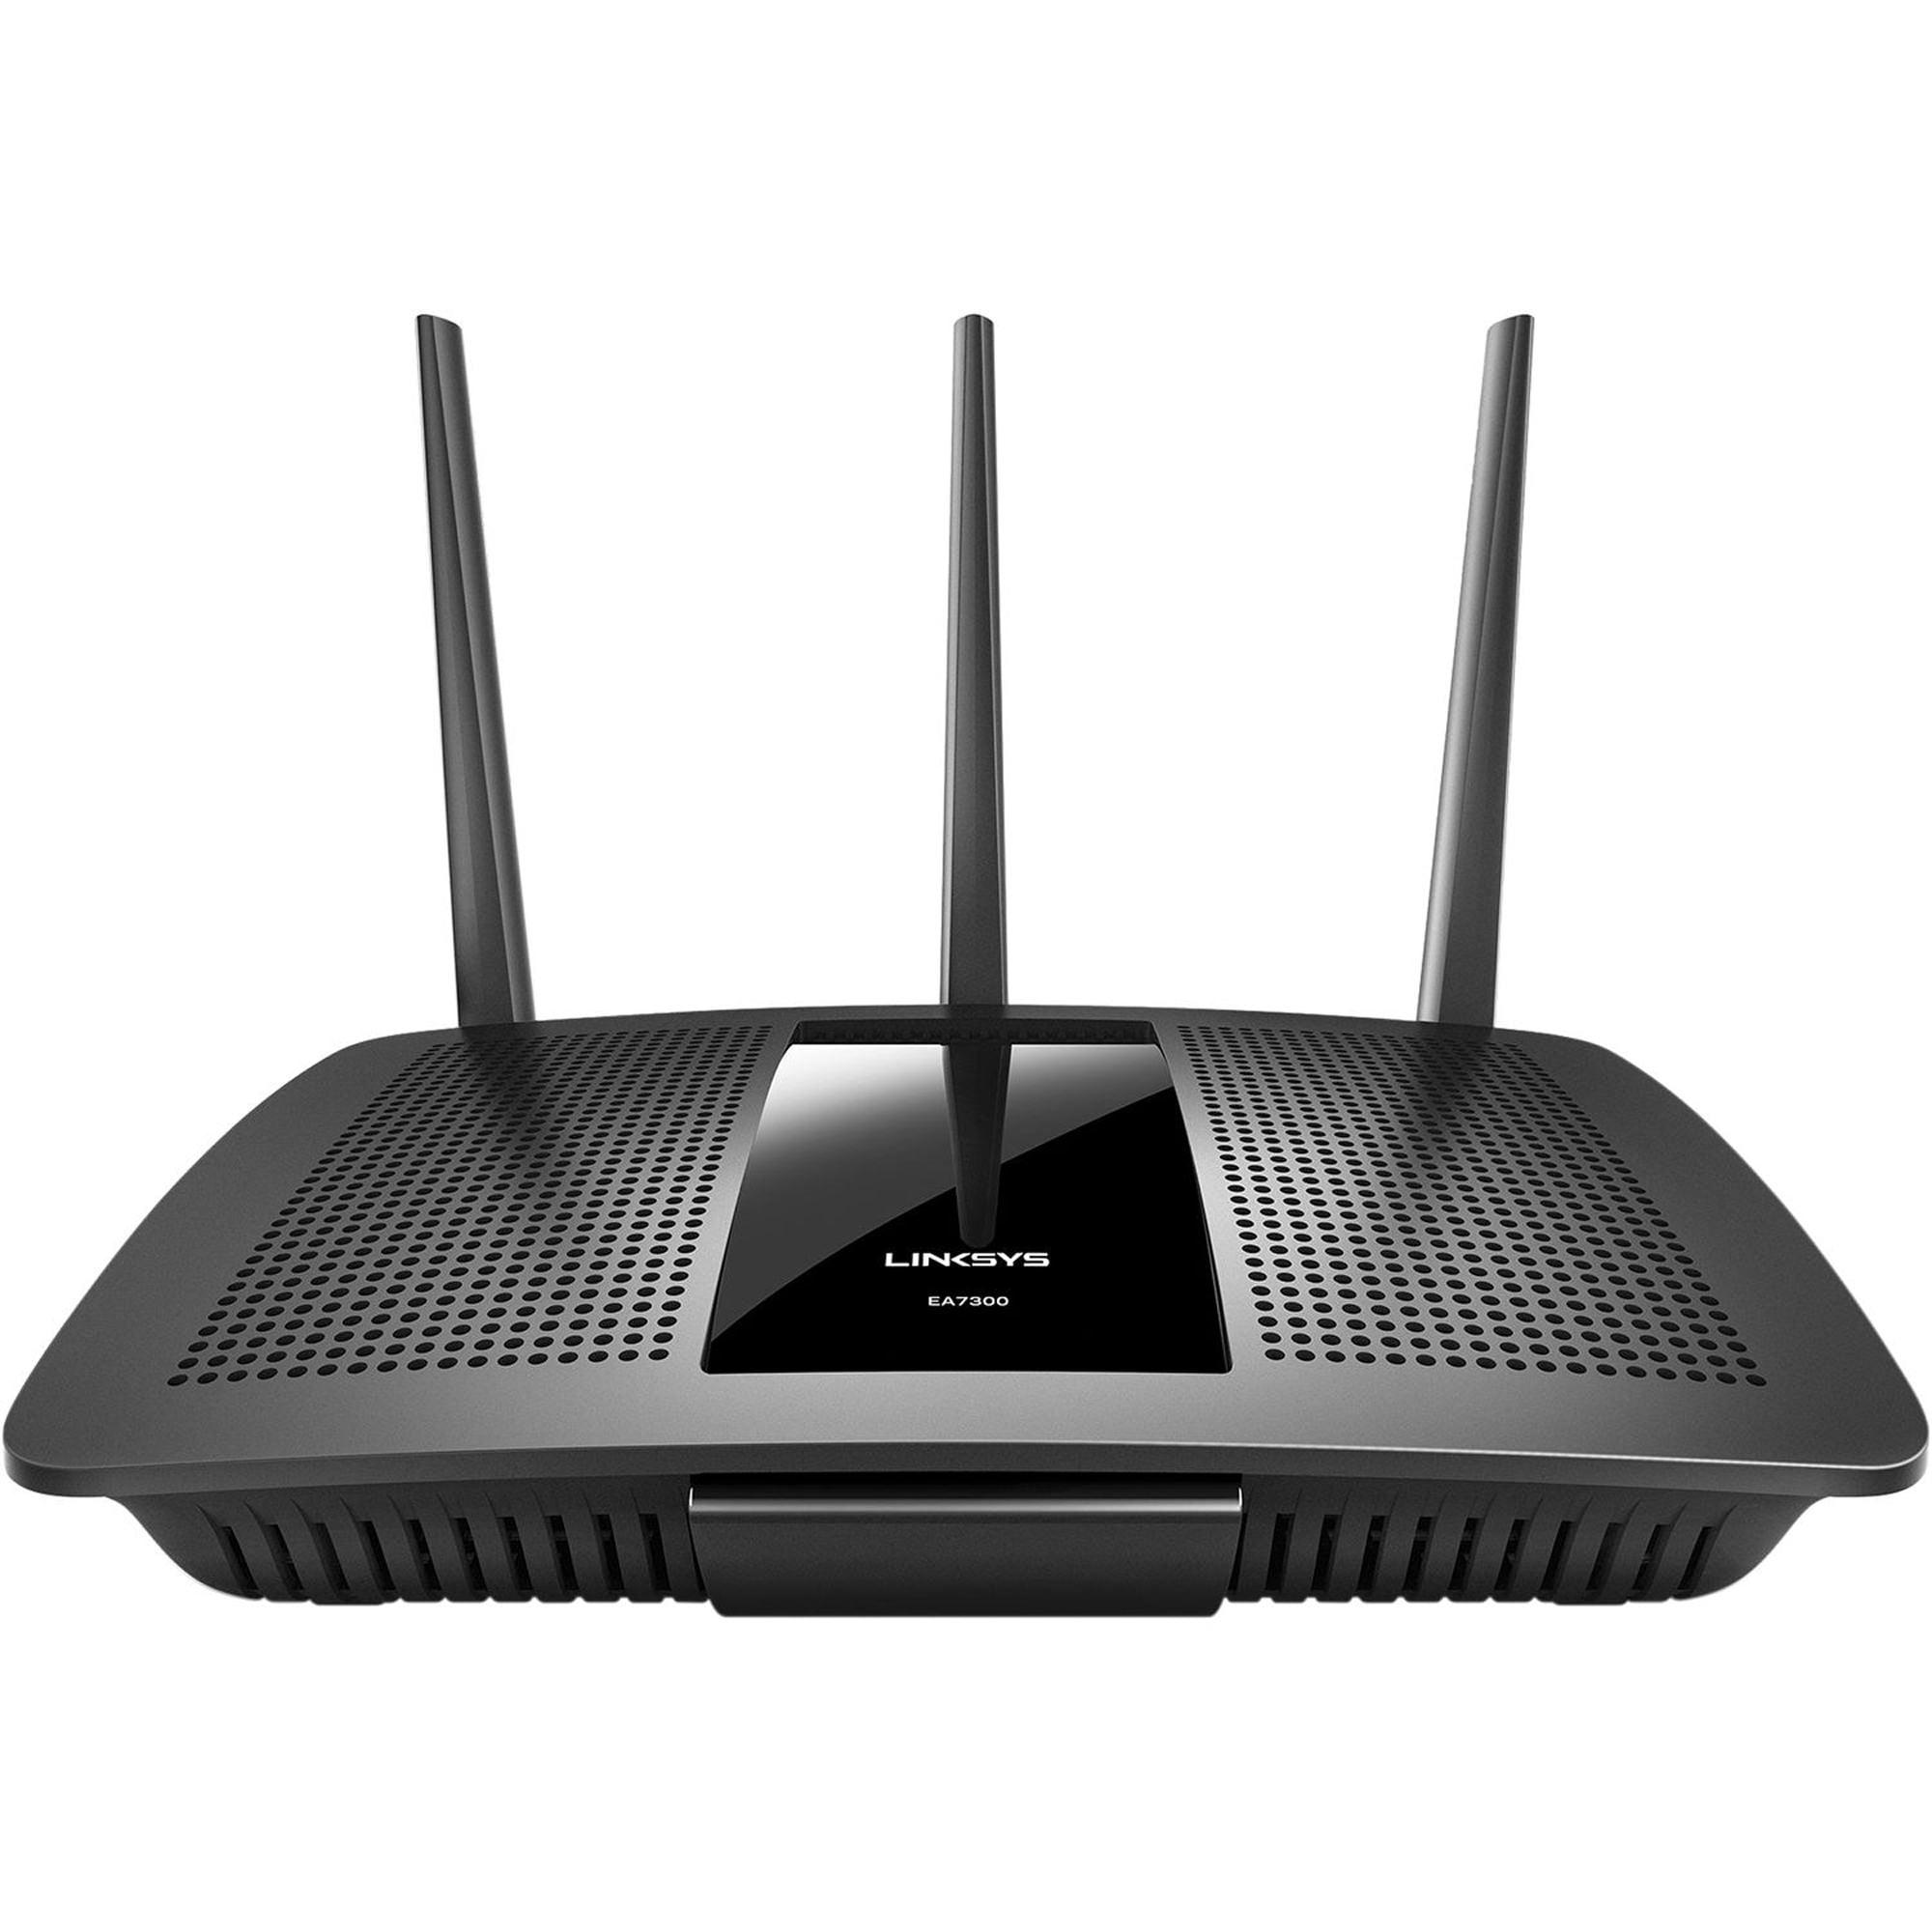 Linksys EA7300 MAX-STREAM AC1750 MU-MIMO Gigabit WiFi Router (Certified Refurbished)